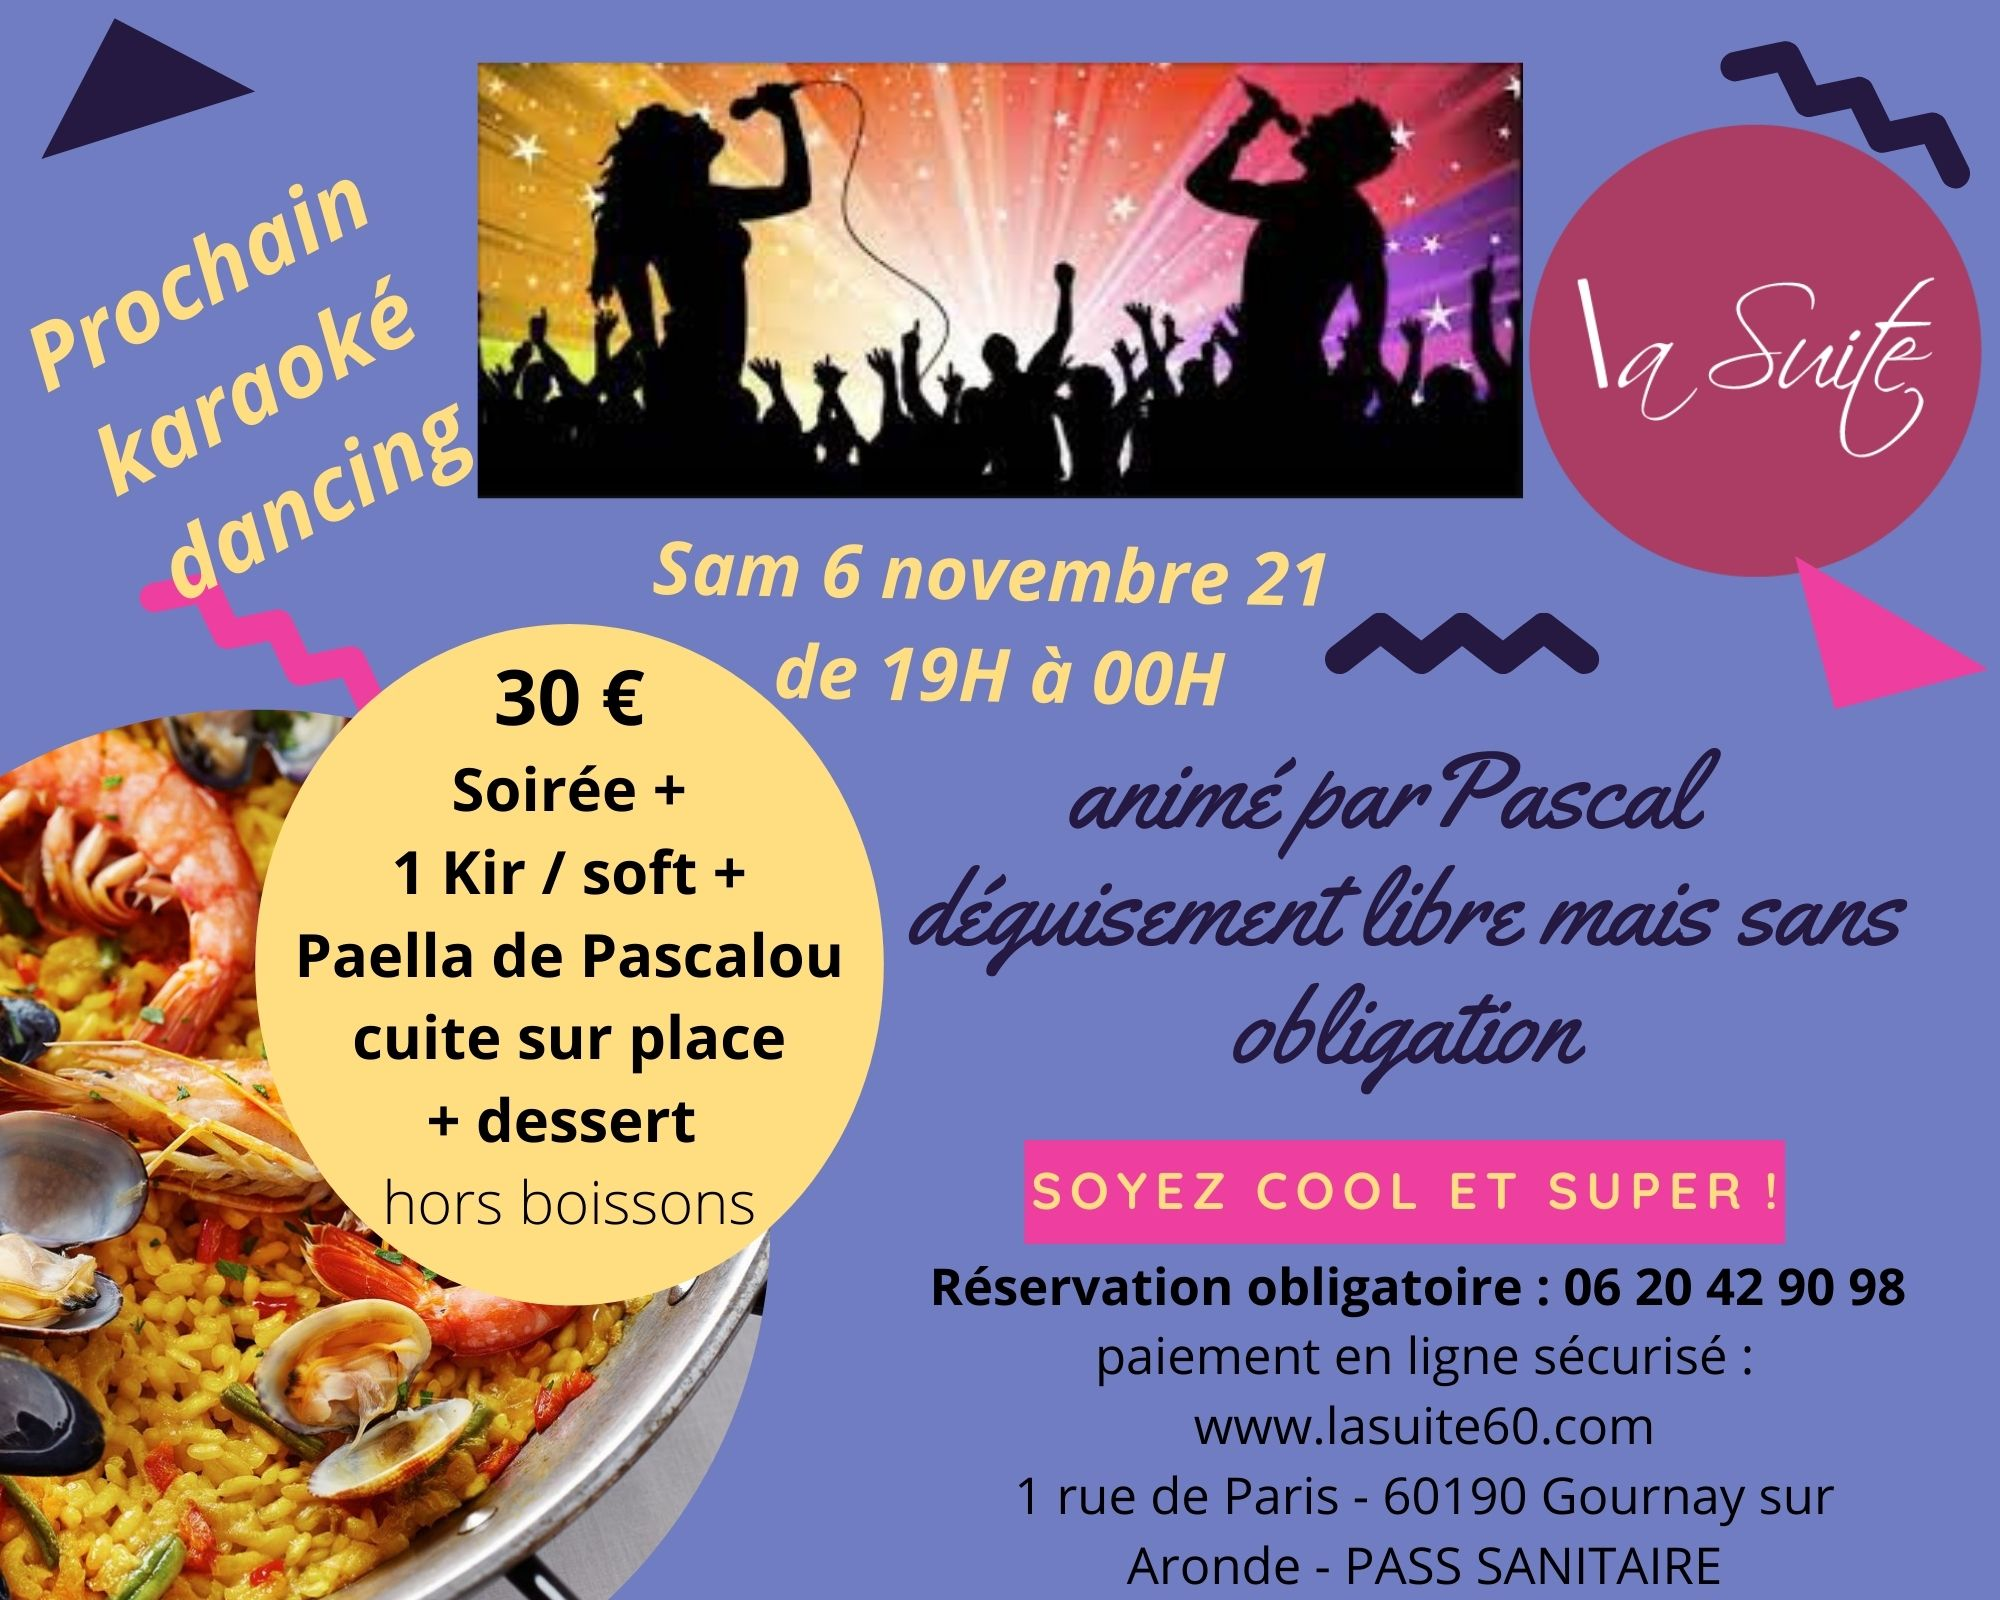 soiree-karaoke-6-nov-21